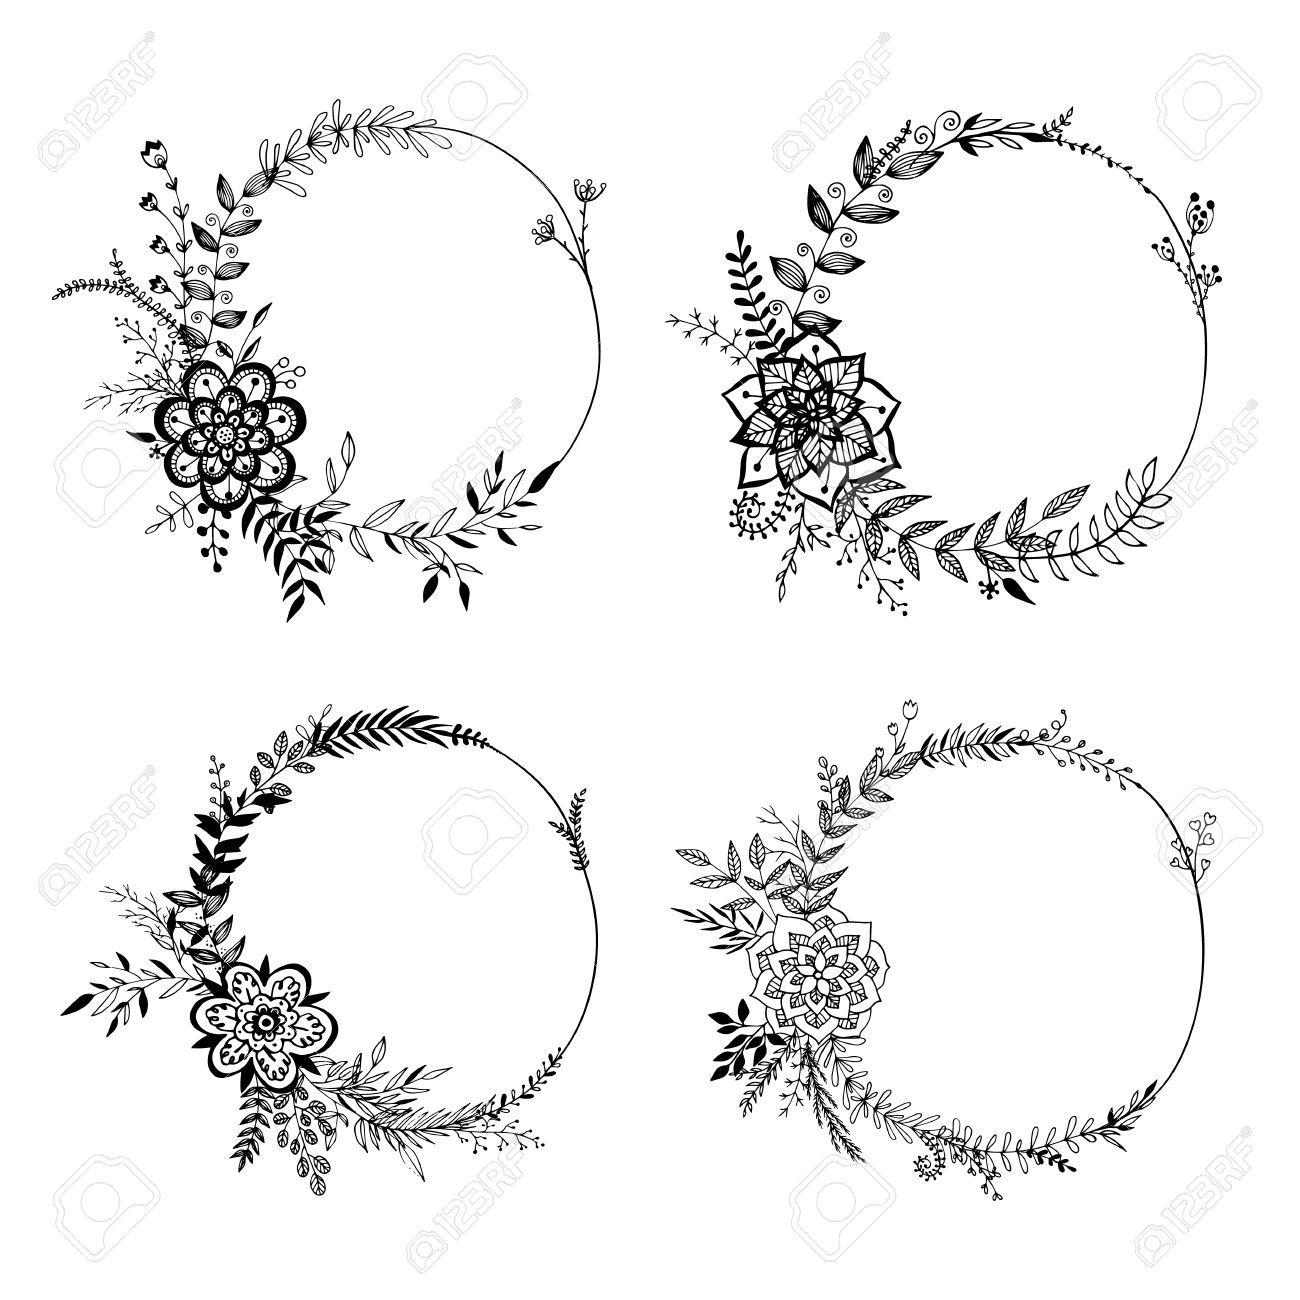 1300x1300 Wreath Drawing Vintage